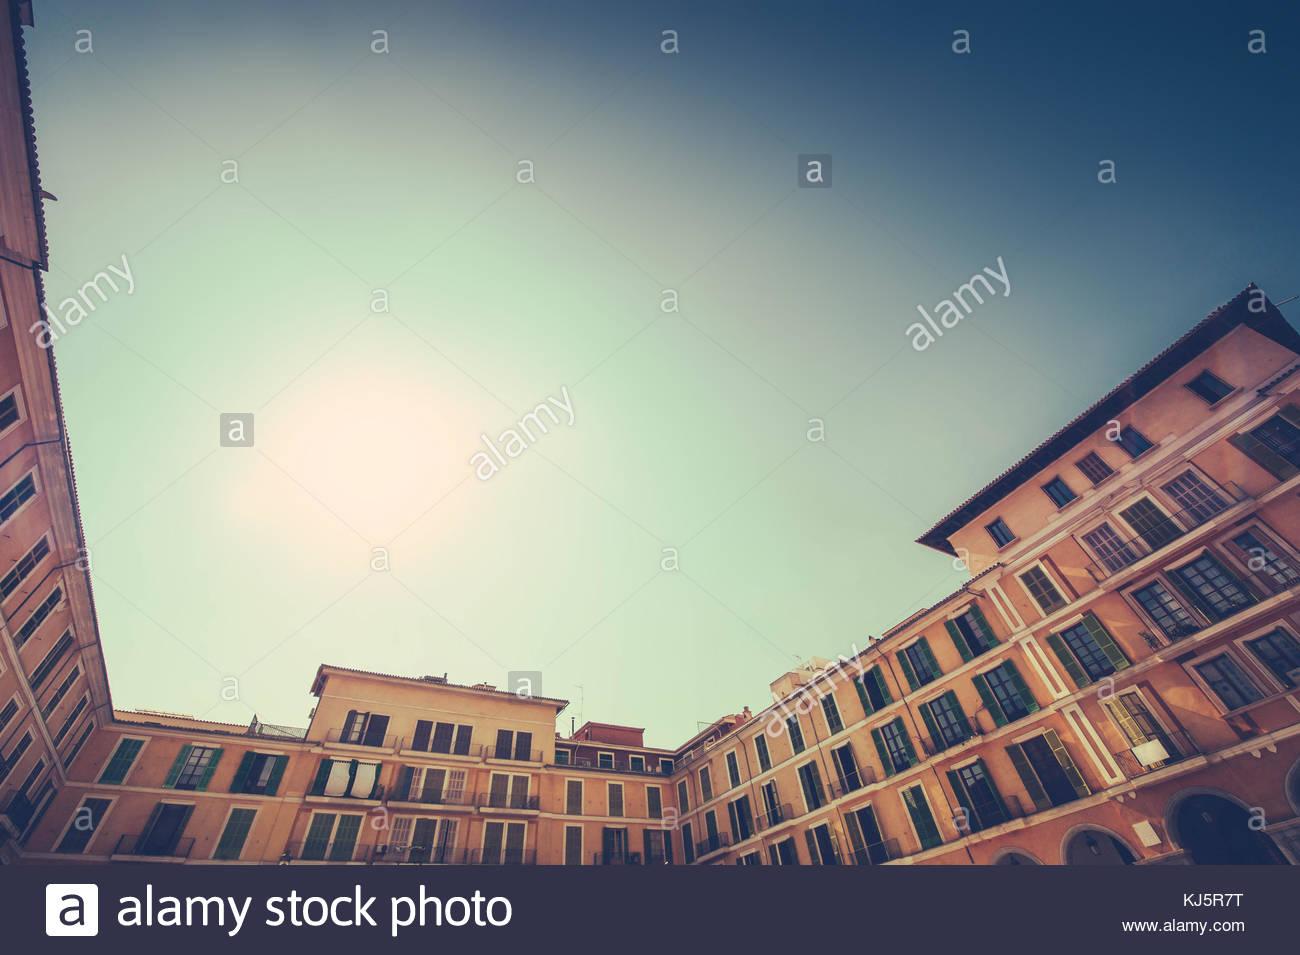 residential housing - Stock Image